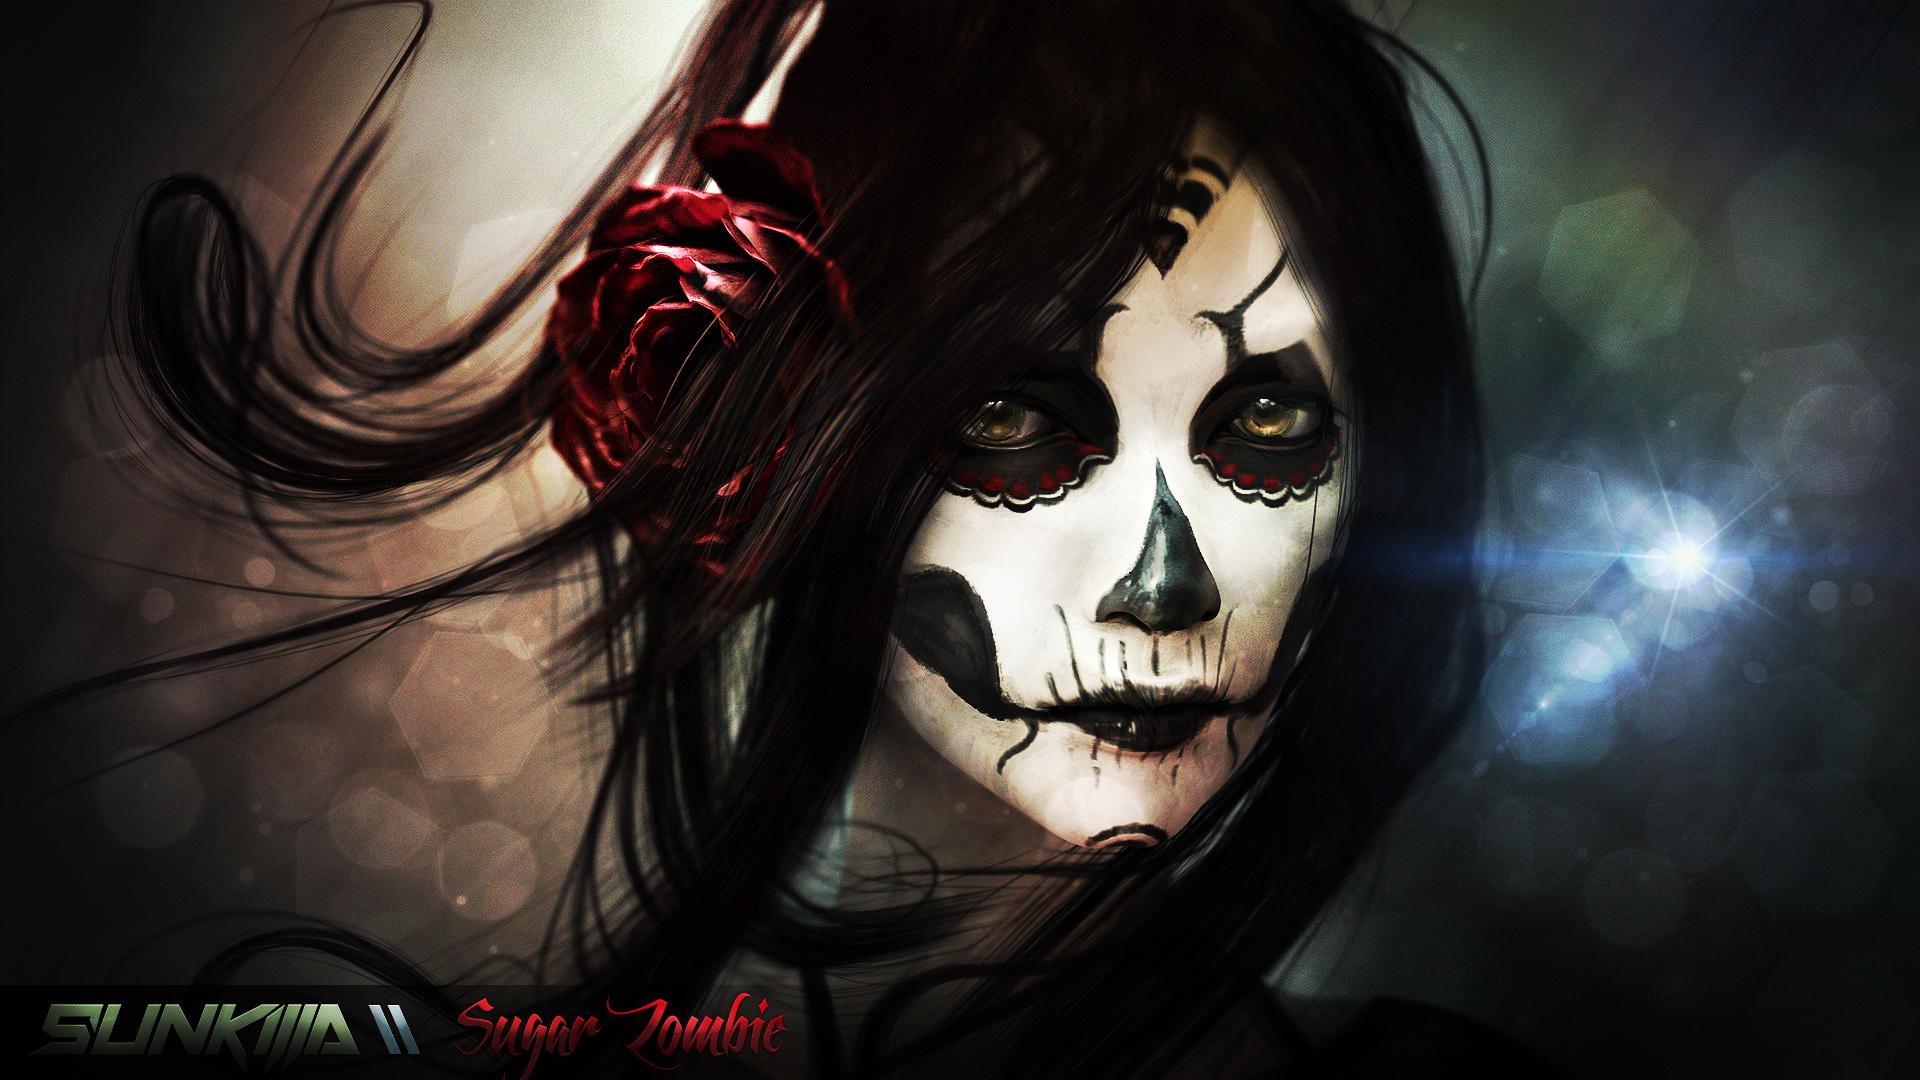 Sugar Zombie by Sunkilla-FR